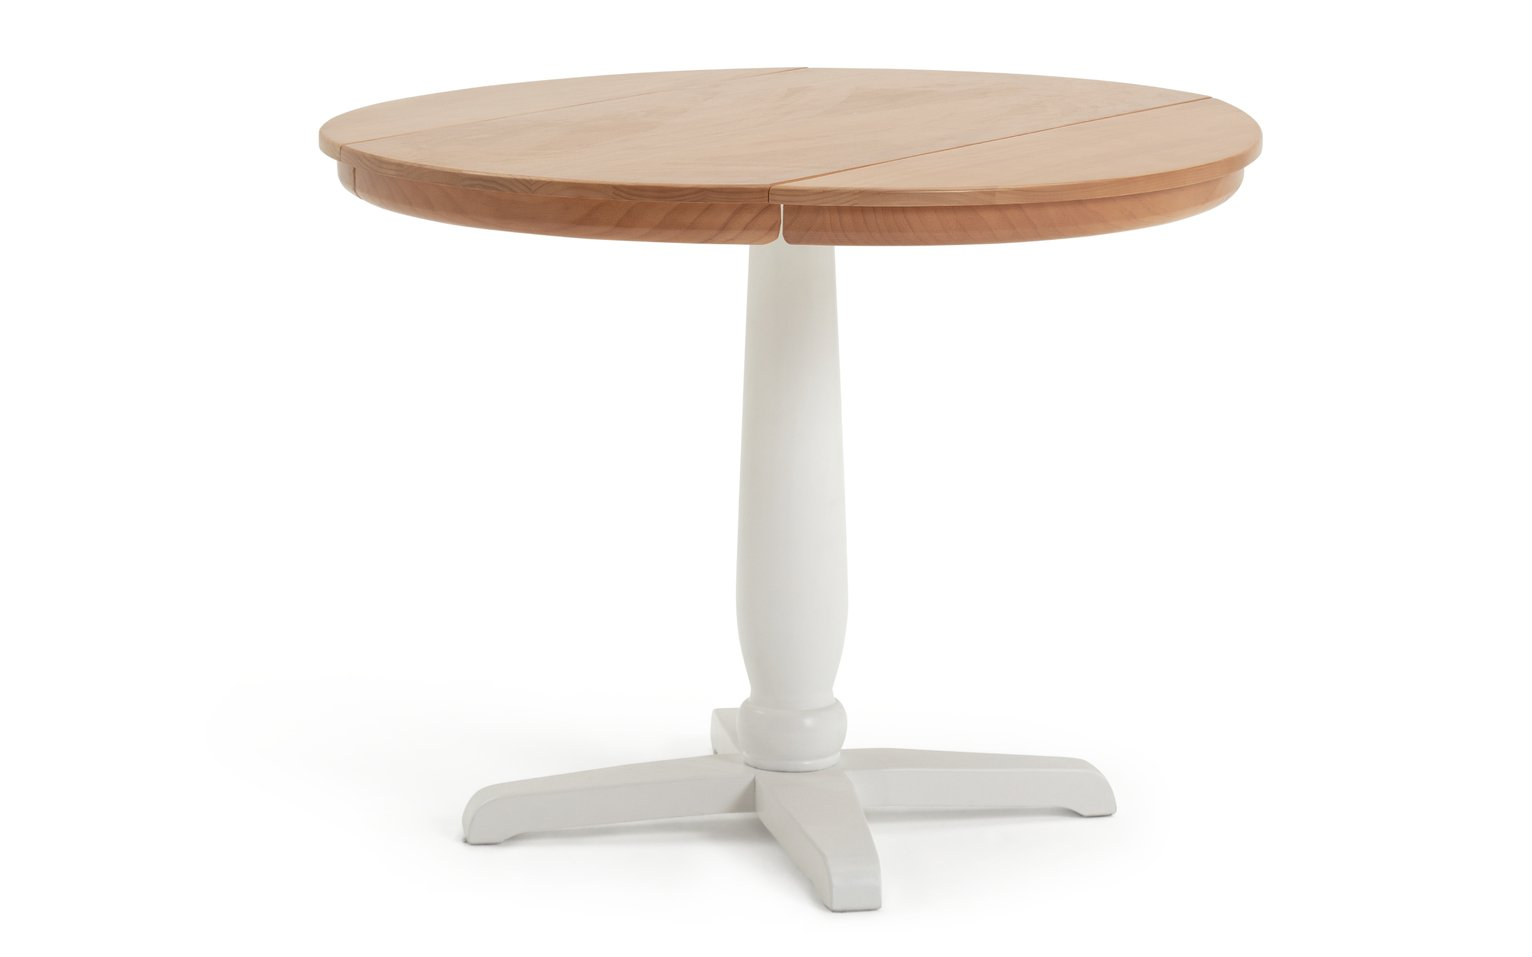 Habitat Otis Solid Wood 4 Seater Dining Table - White